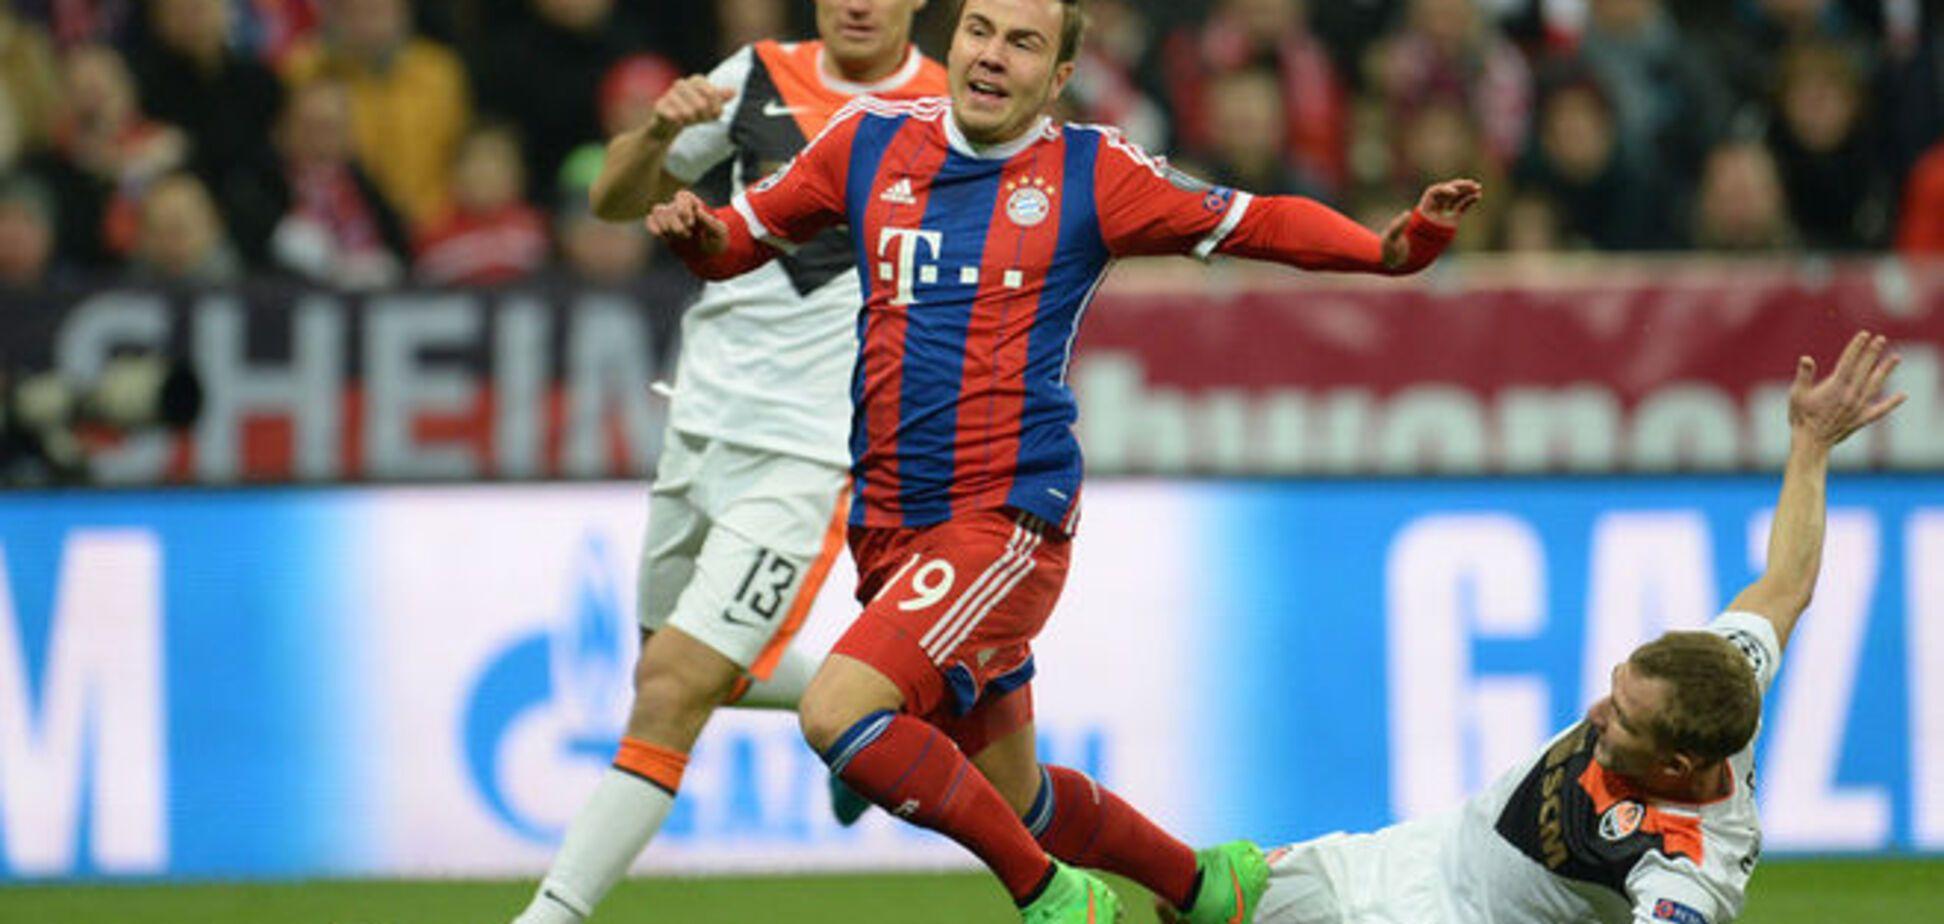 Главный неудачник 'Шахтера' взял на себя вину за разгром от 'Баварии' в Лиге чемпионов